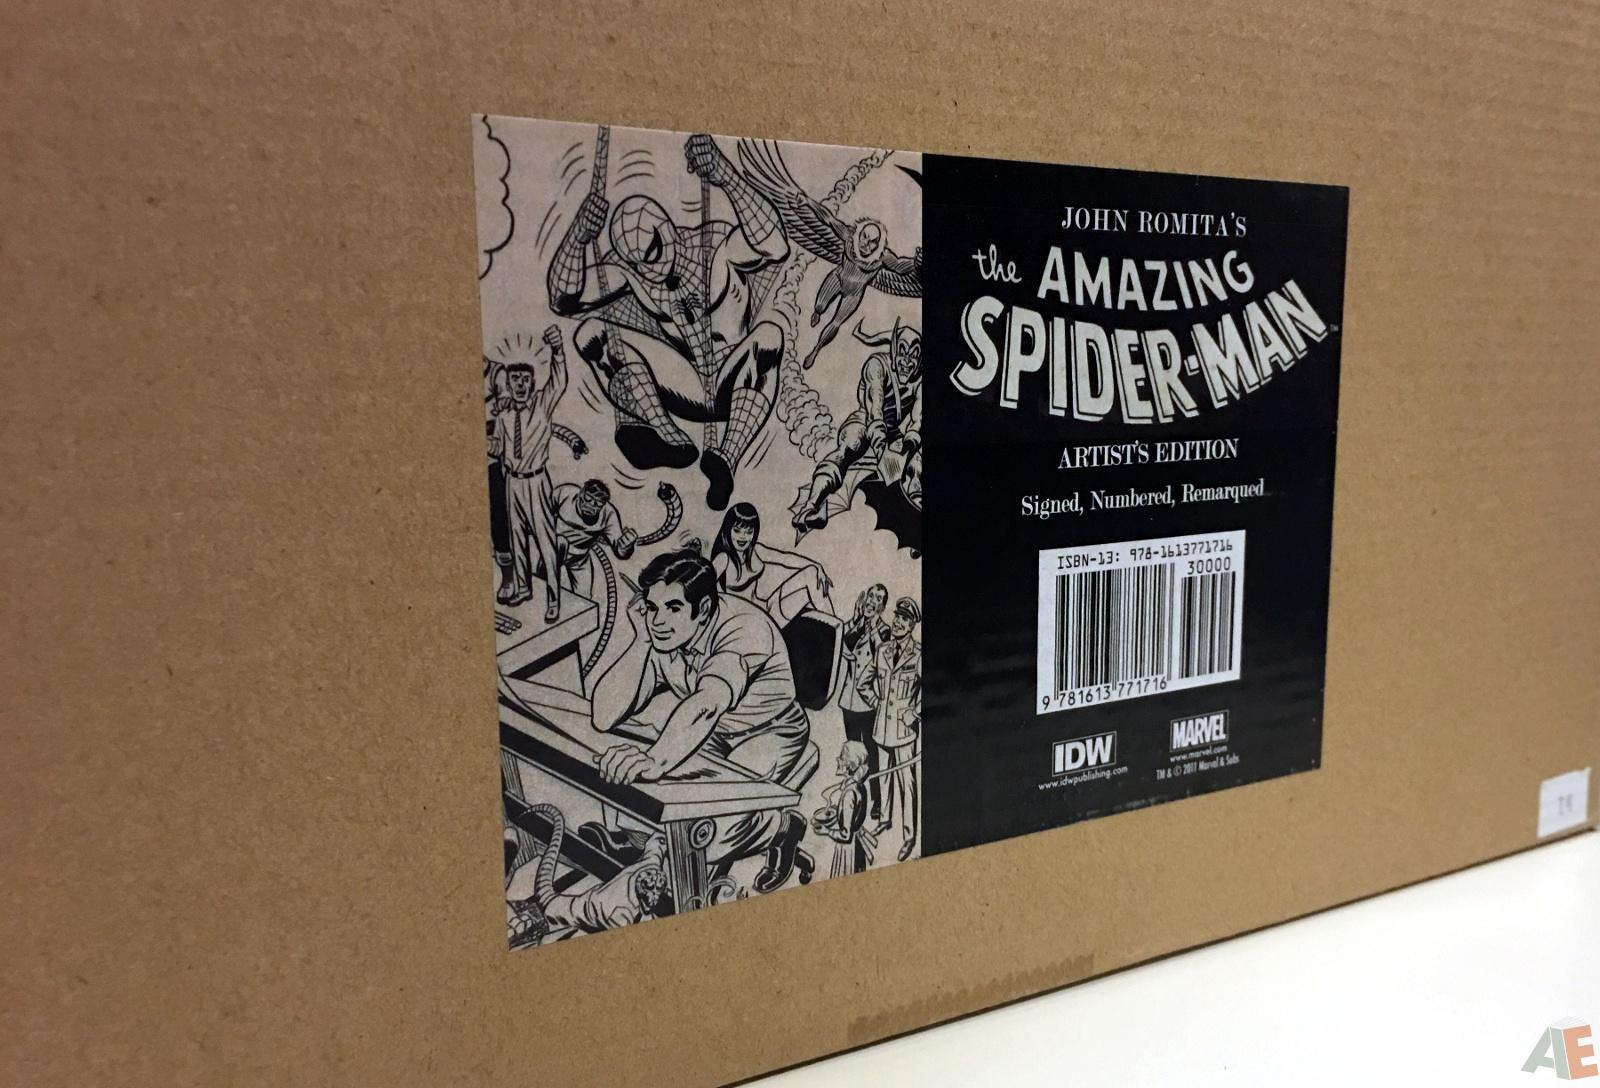 John Romita's The Amazing Spider-Man Artist's Edition 62